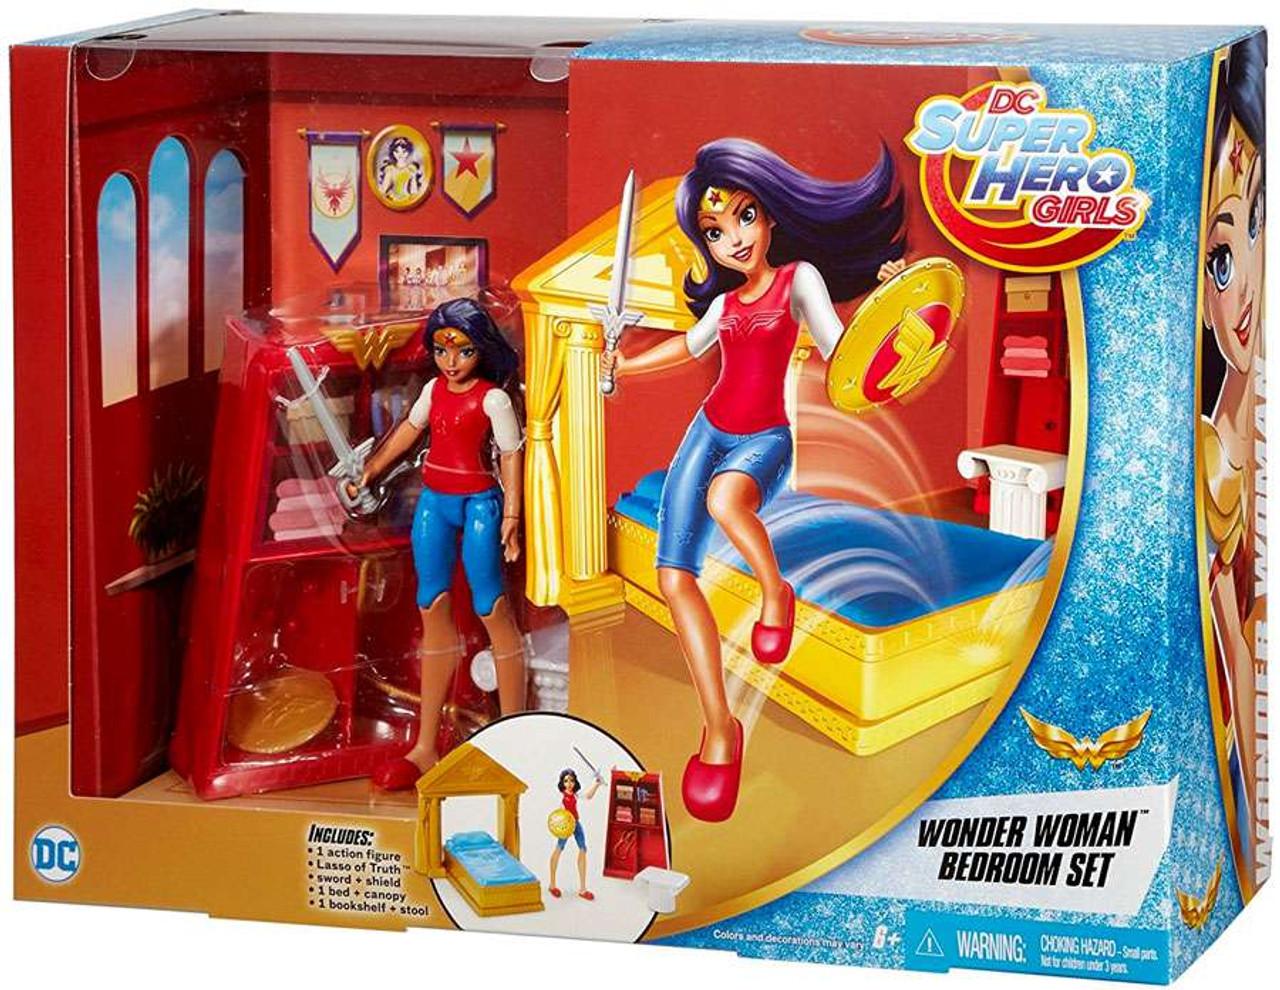 Dc Super Hero Girls Wonder Woman Bedroom Set Mattel Toys